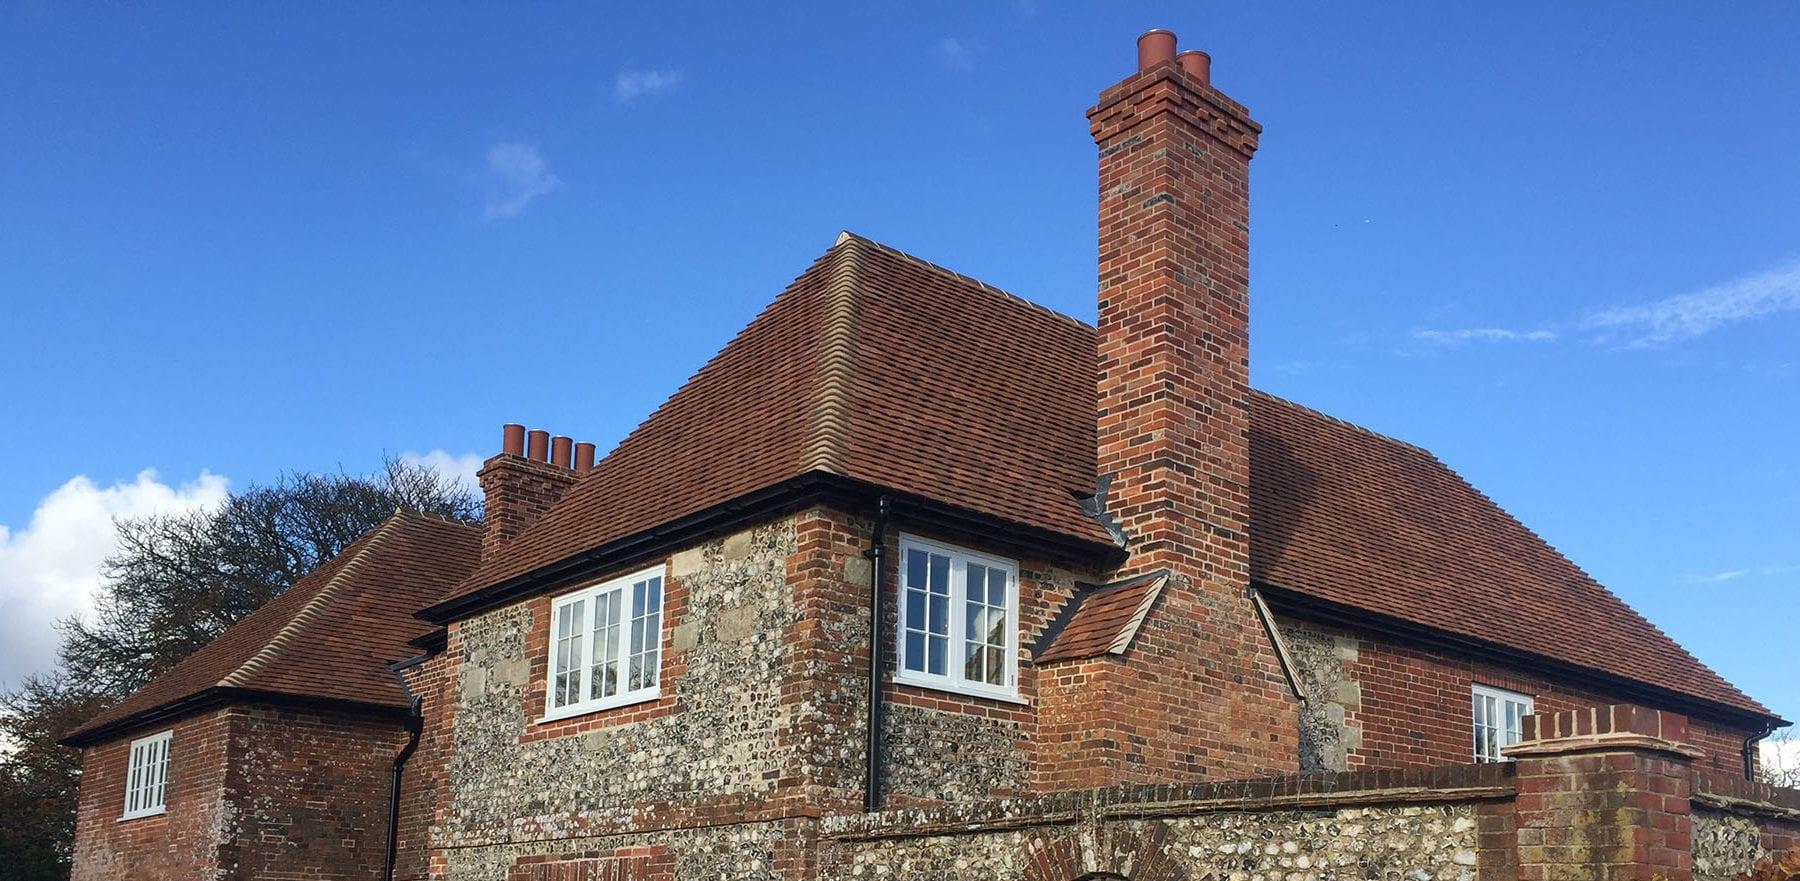 Lifestiles - Handmade Heather Clay Roof Tiles - Barlow, England 2